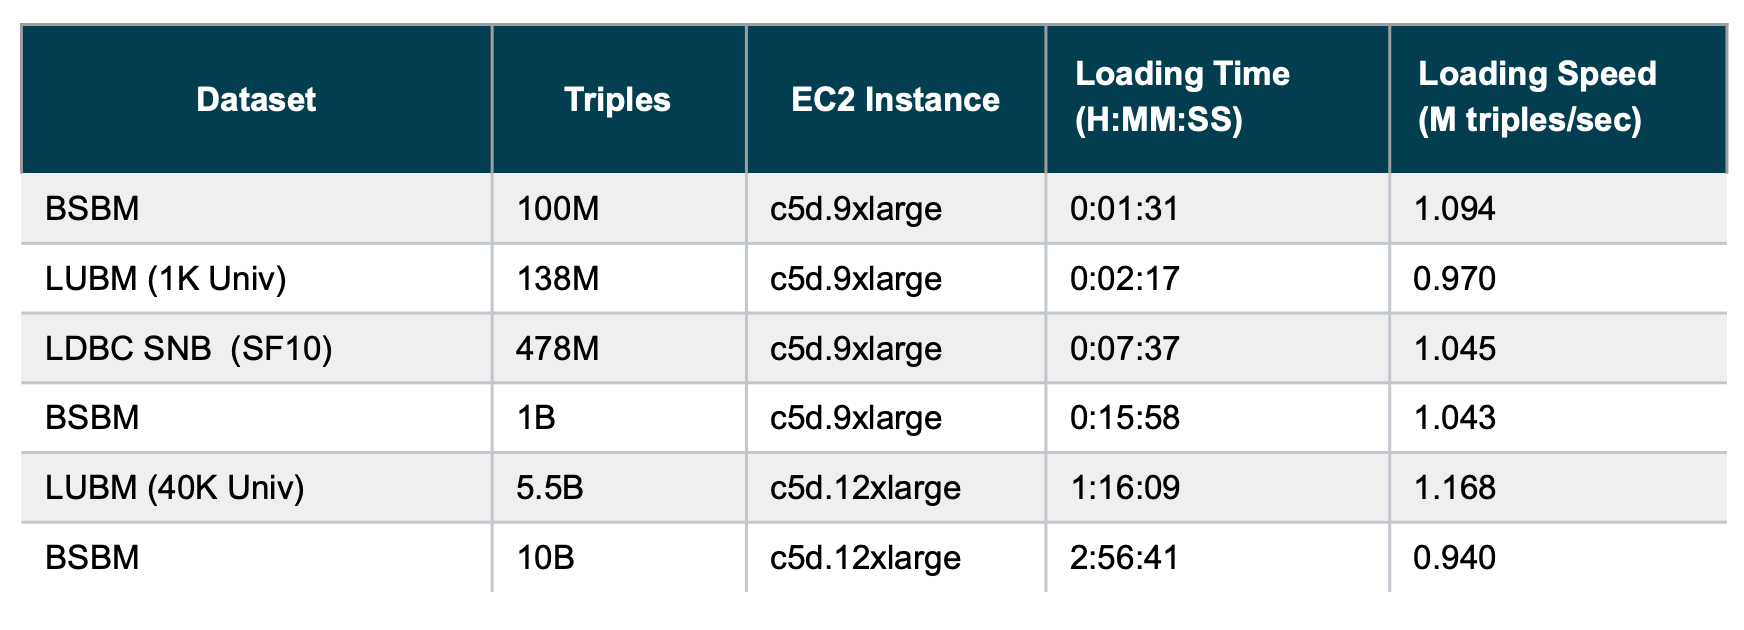 Table of loading speeds for benchmark datasets